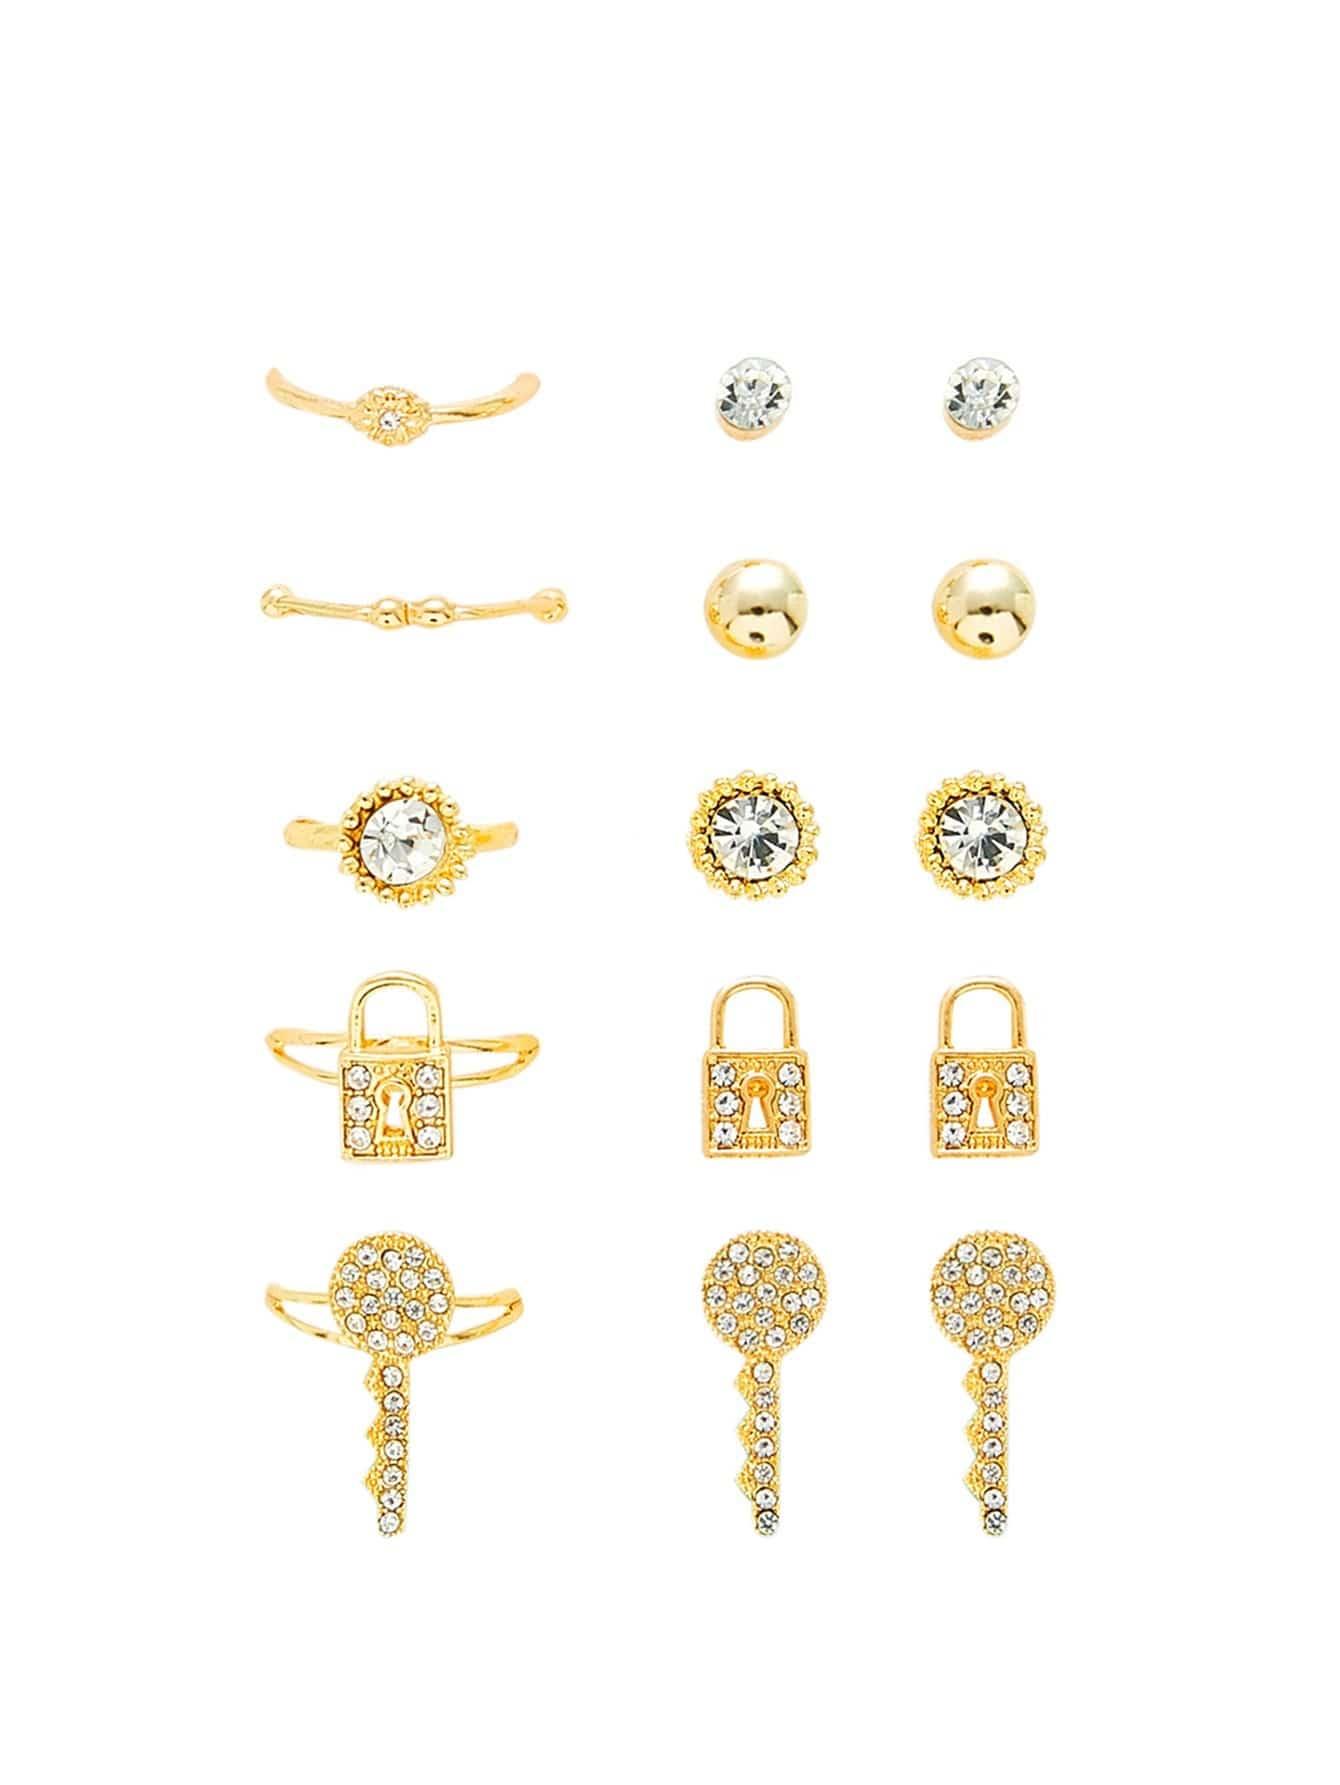 Lock & Key Ring & Earring Set electronic door lock remote control password mechanical key digital intelligent smart entry keyless lock l